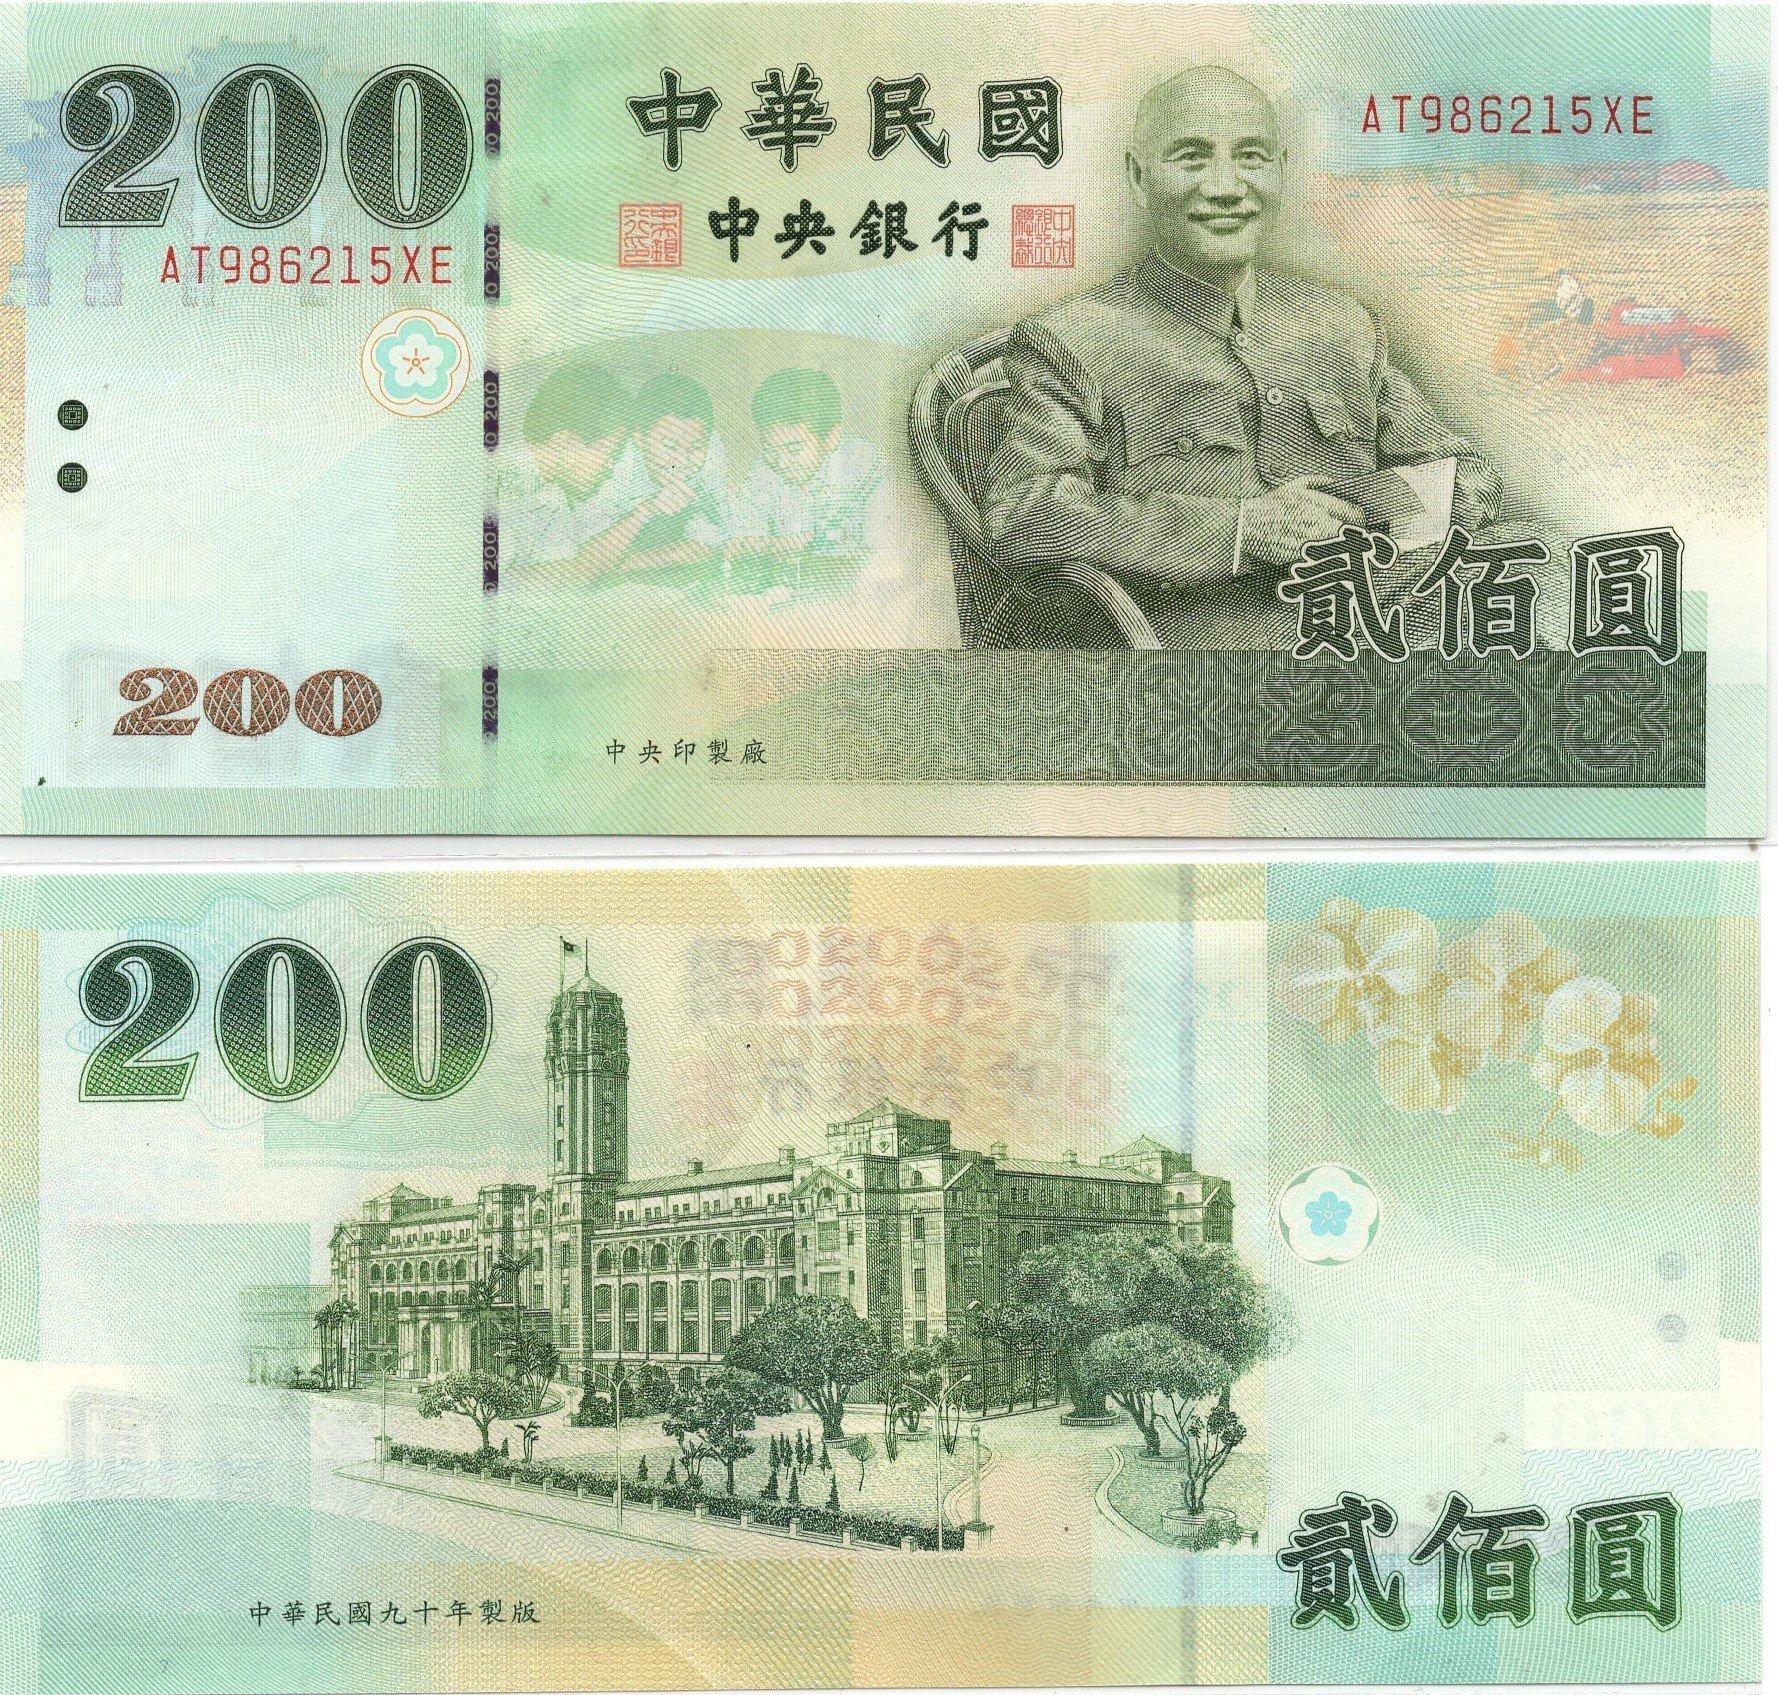 Taiwan 200 yuan